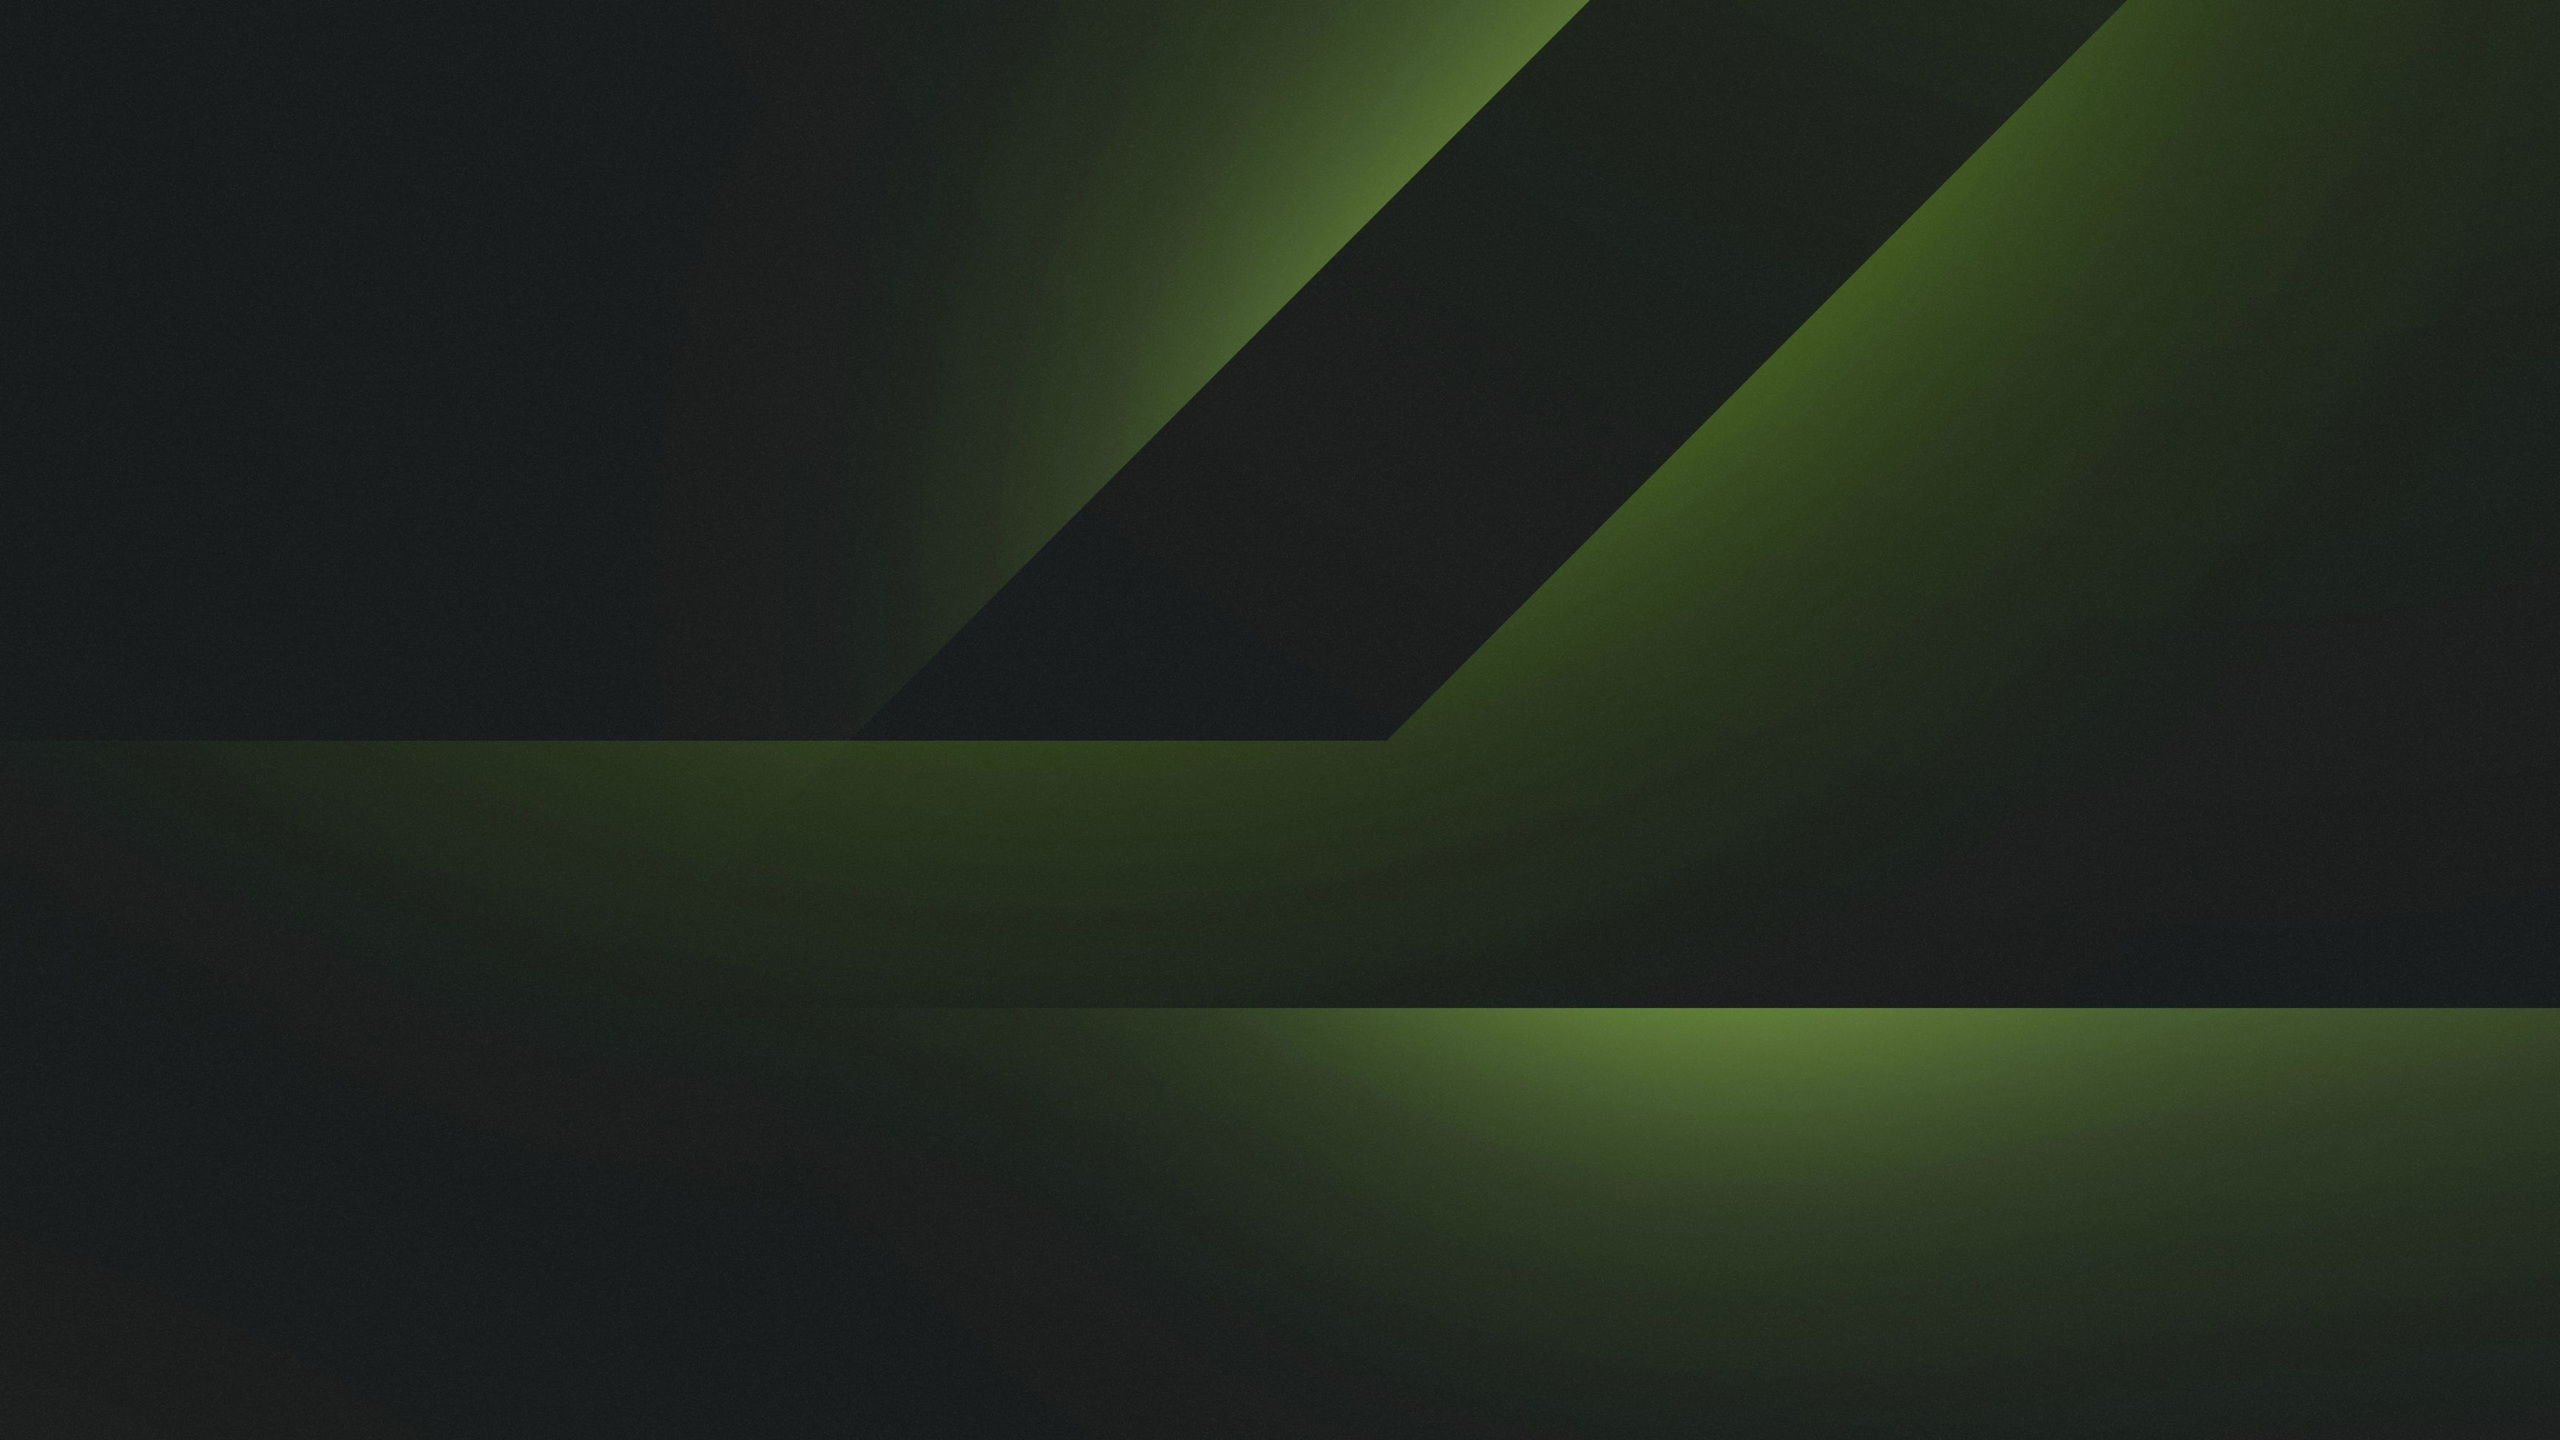 2560x1440 Abstract Dark Green 4k 1440p Resolution Hd 4k